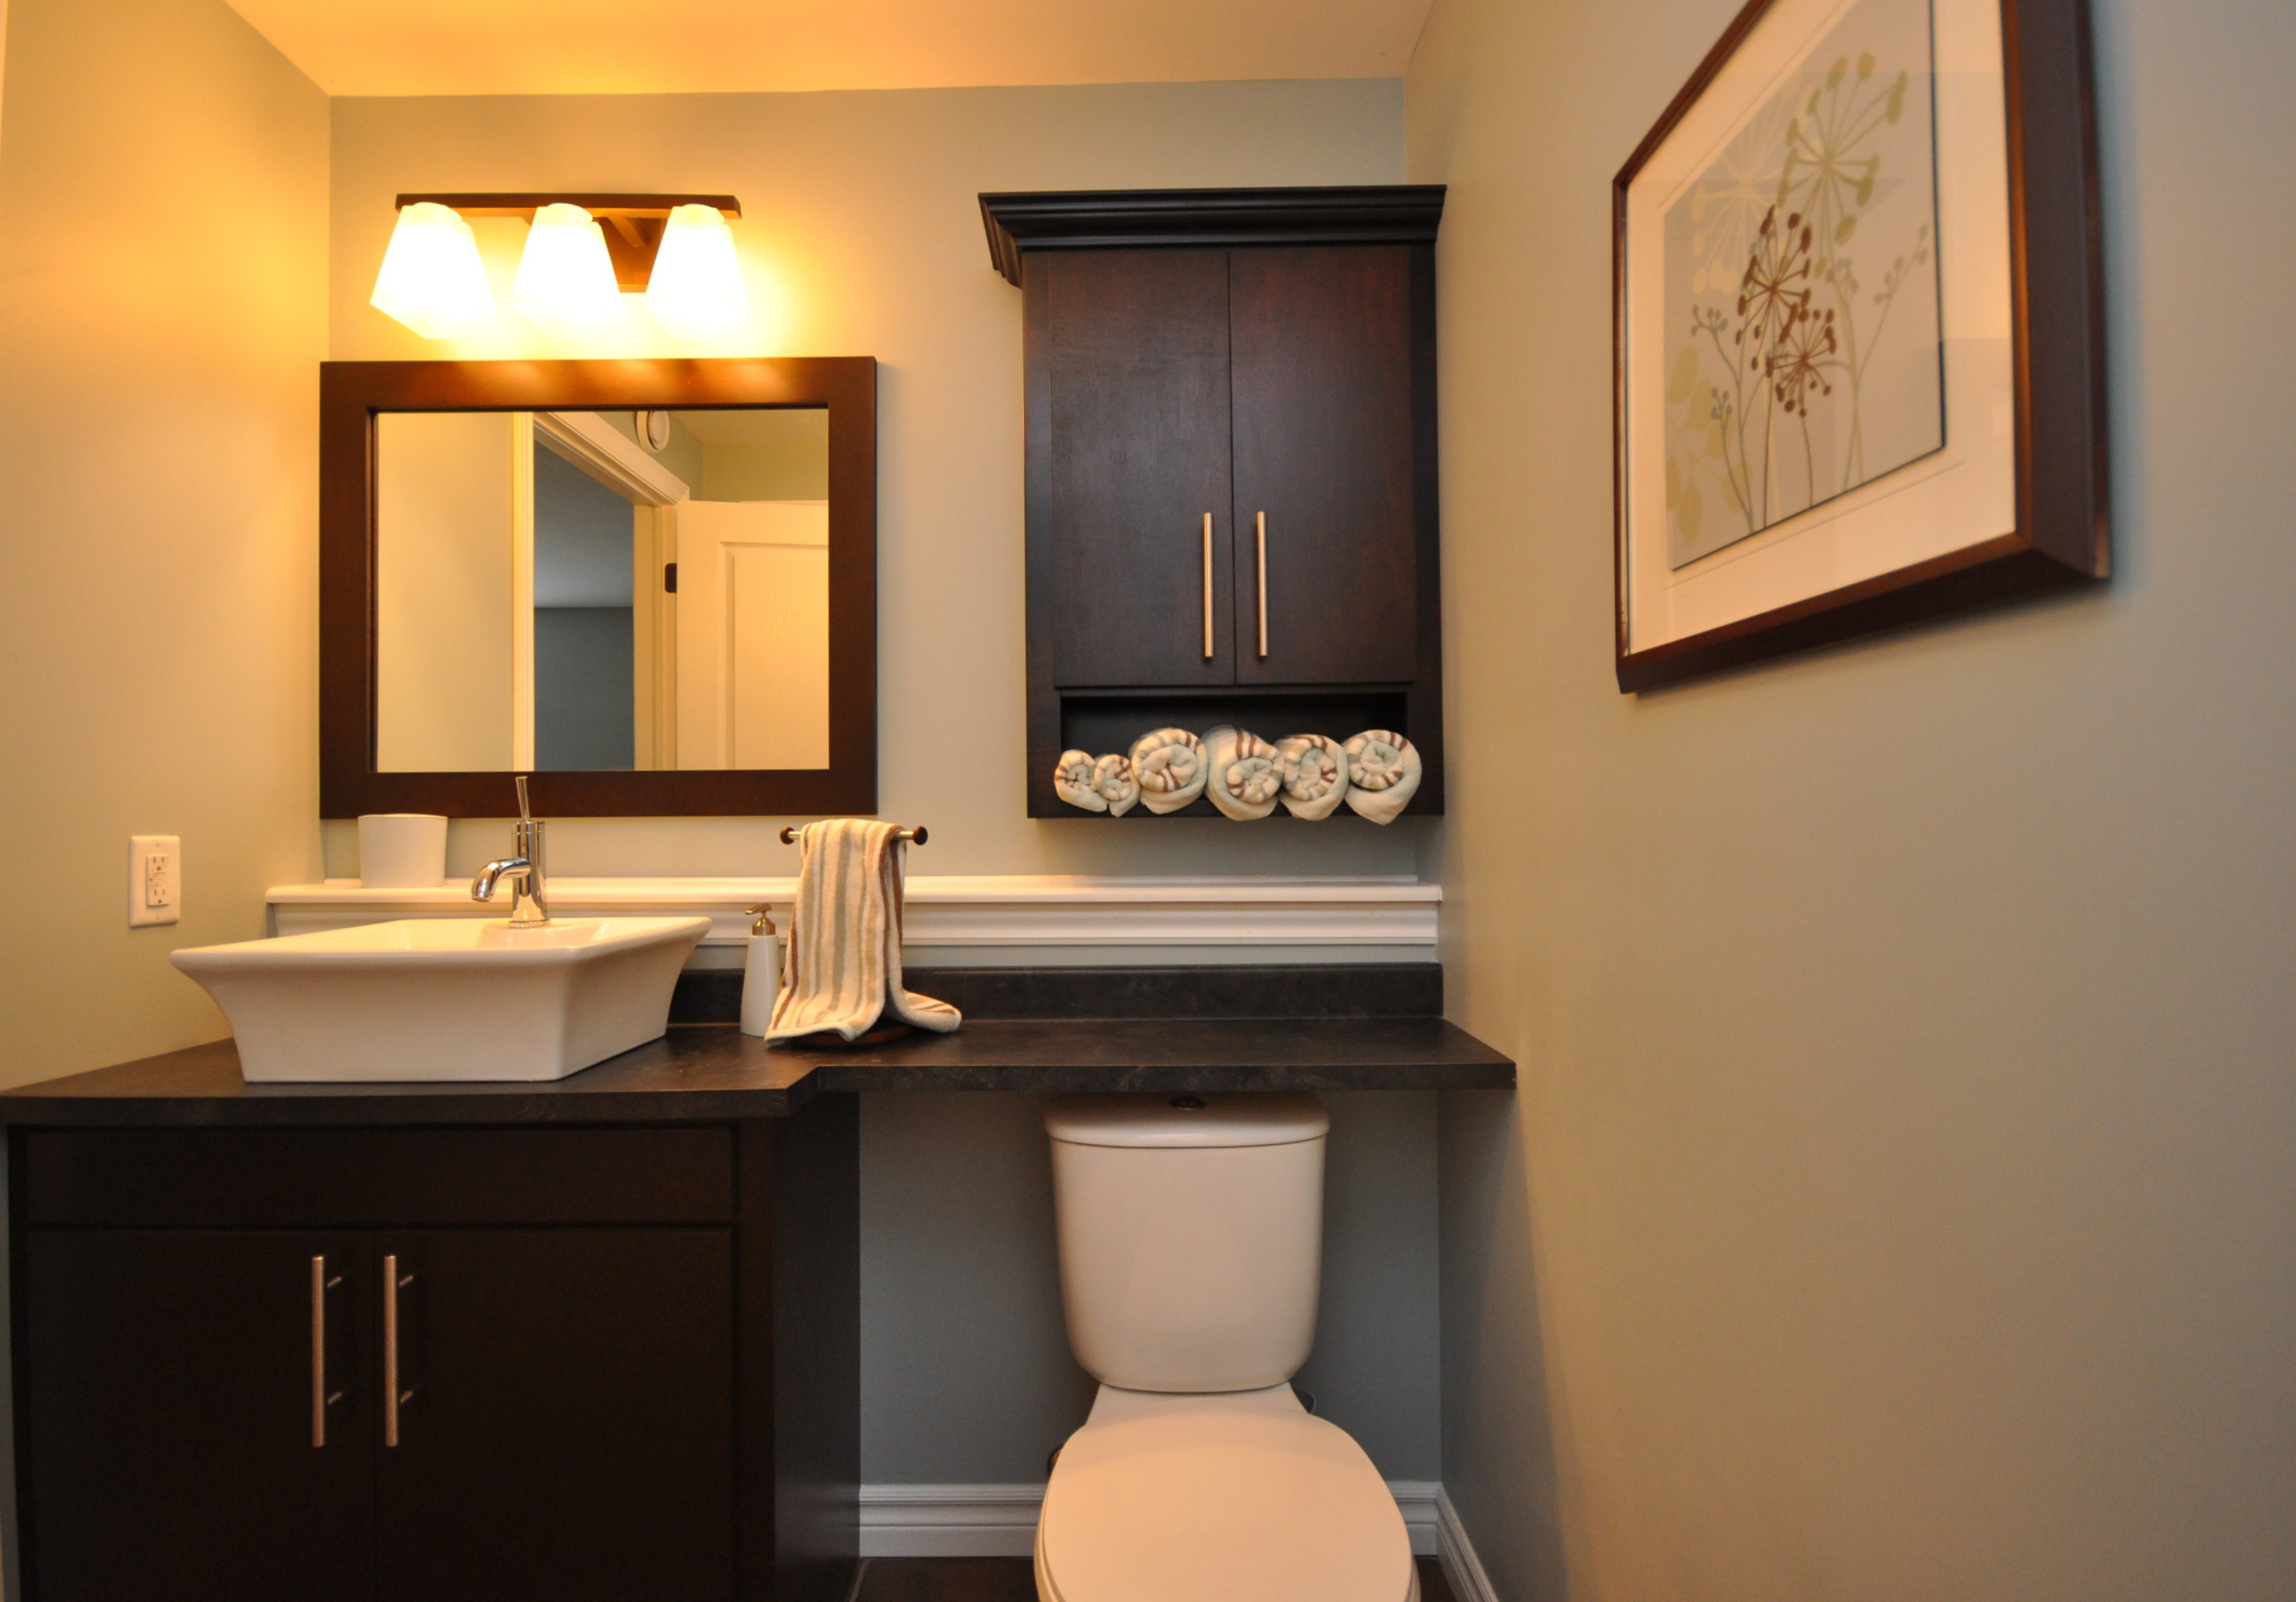 Over toilet Bathroom Cabinet Elegant Black Bathroom Cabinets Over toilet Home Decor by Reisa Design